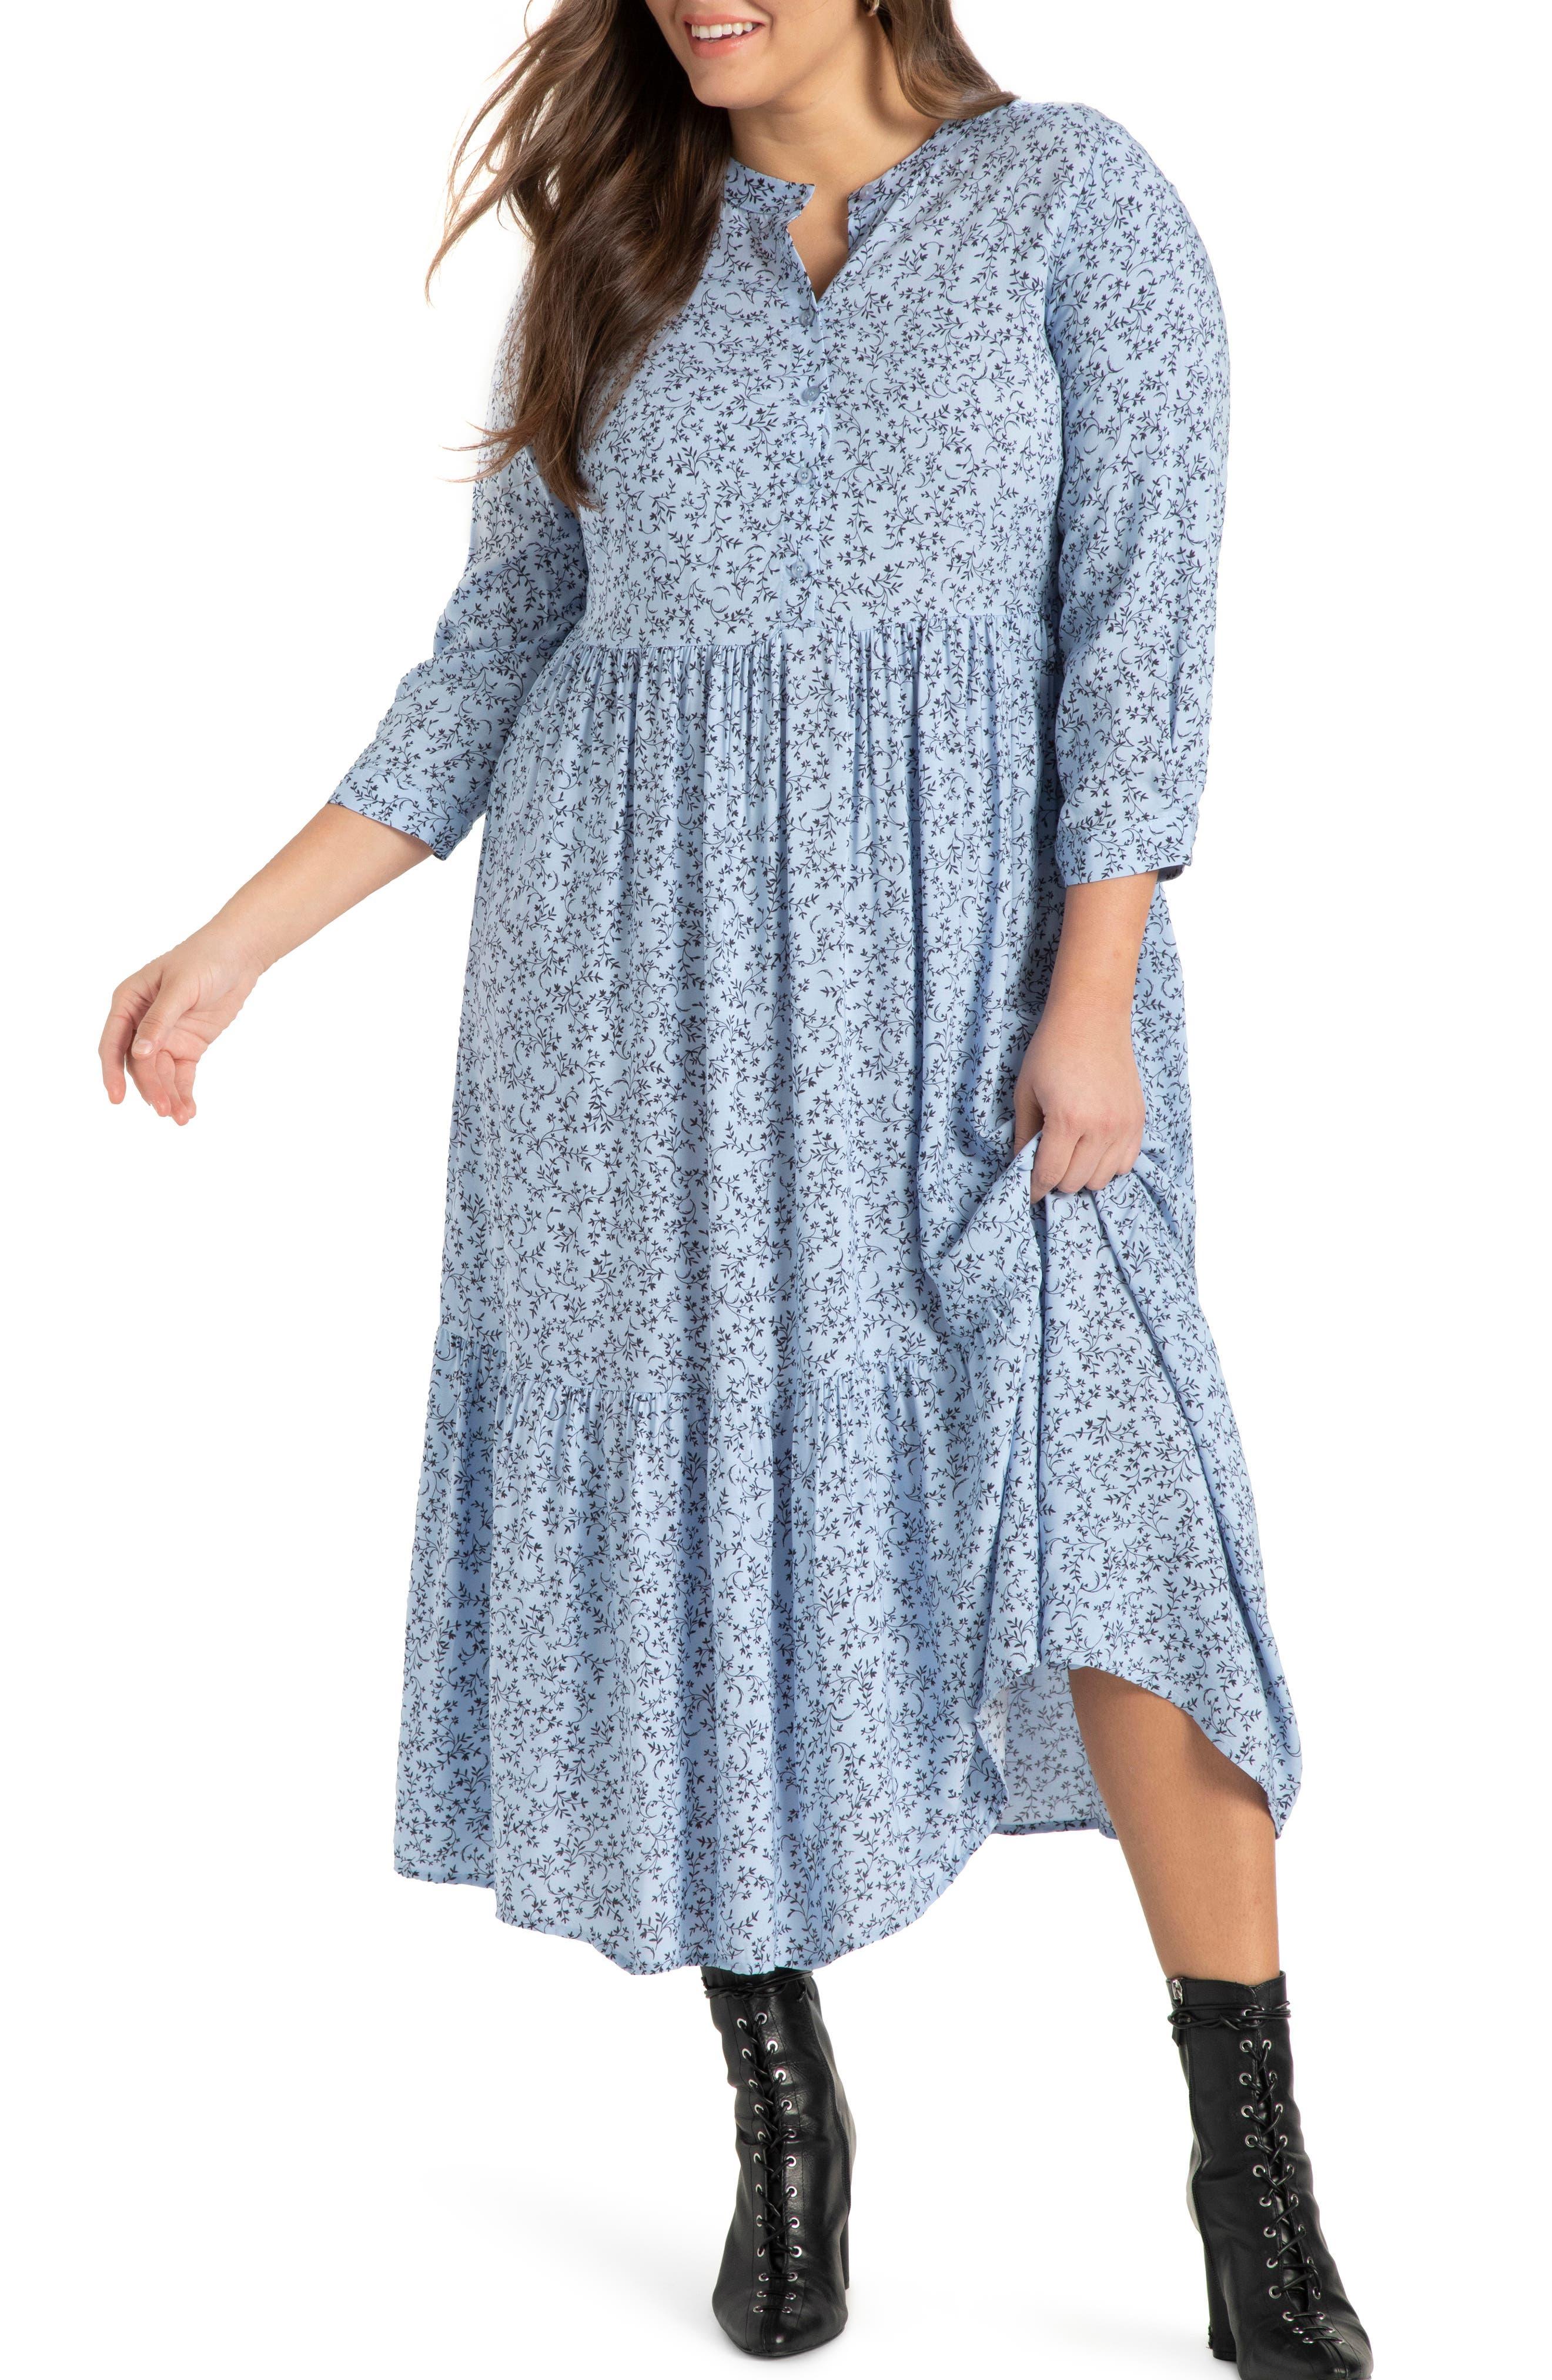 70s Dresses – Disco Dress, Hippie Dress, Wrap Dress Plus Size Womens Eloquii Floral Long Sleeve Dress Size 26W - Blue $129.95 AT vintagedancer.com